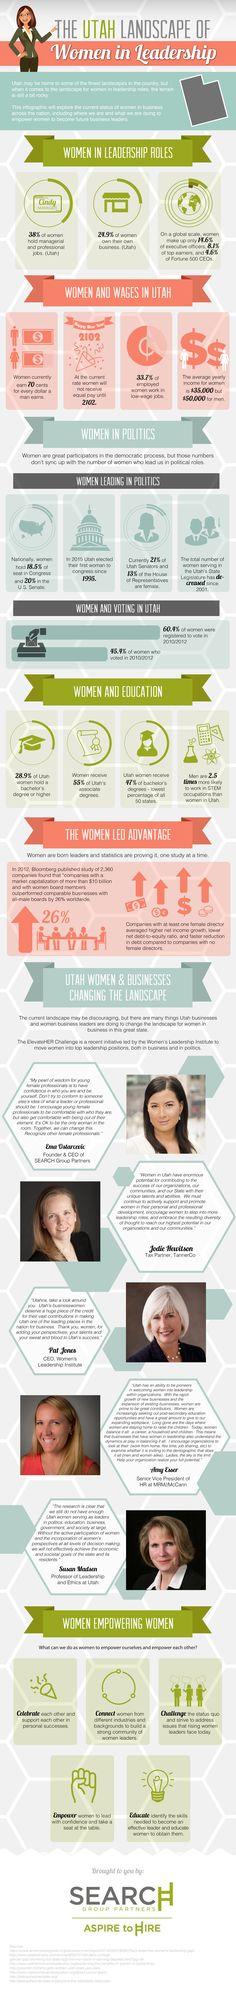 The Utah Landscape of Women in Leadership http://searchgrouppartners.com/women-in-leadership/